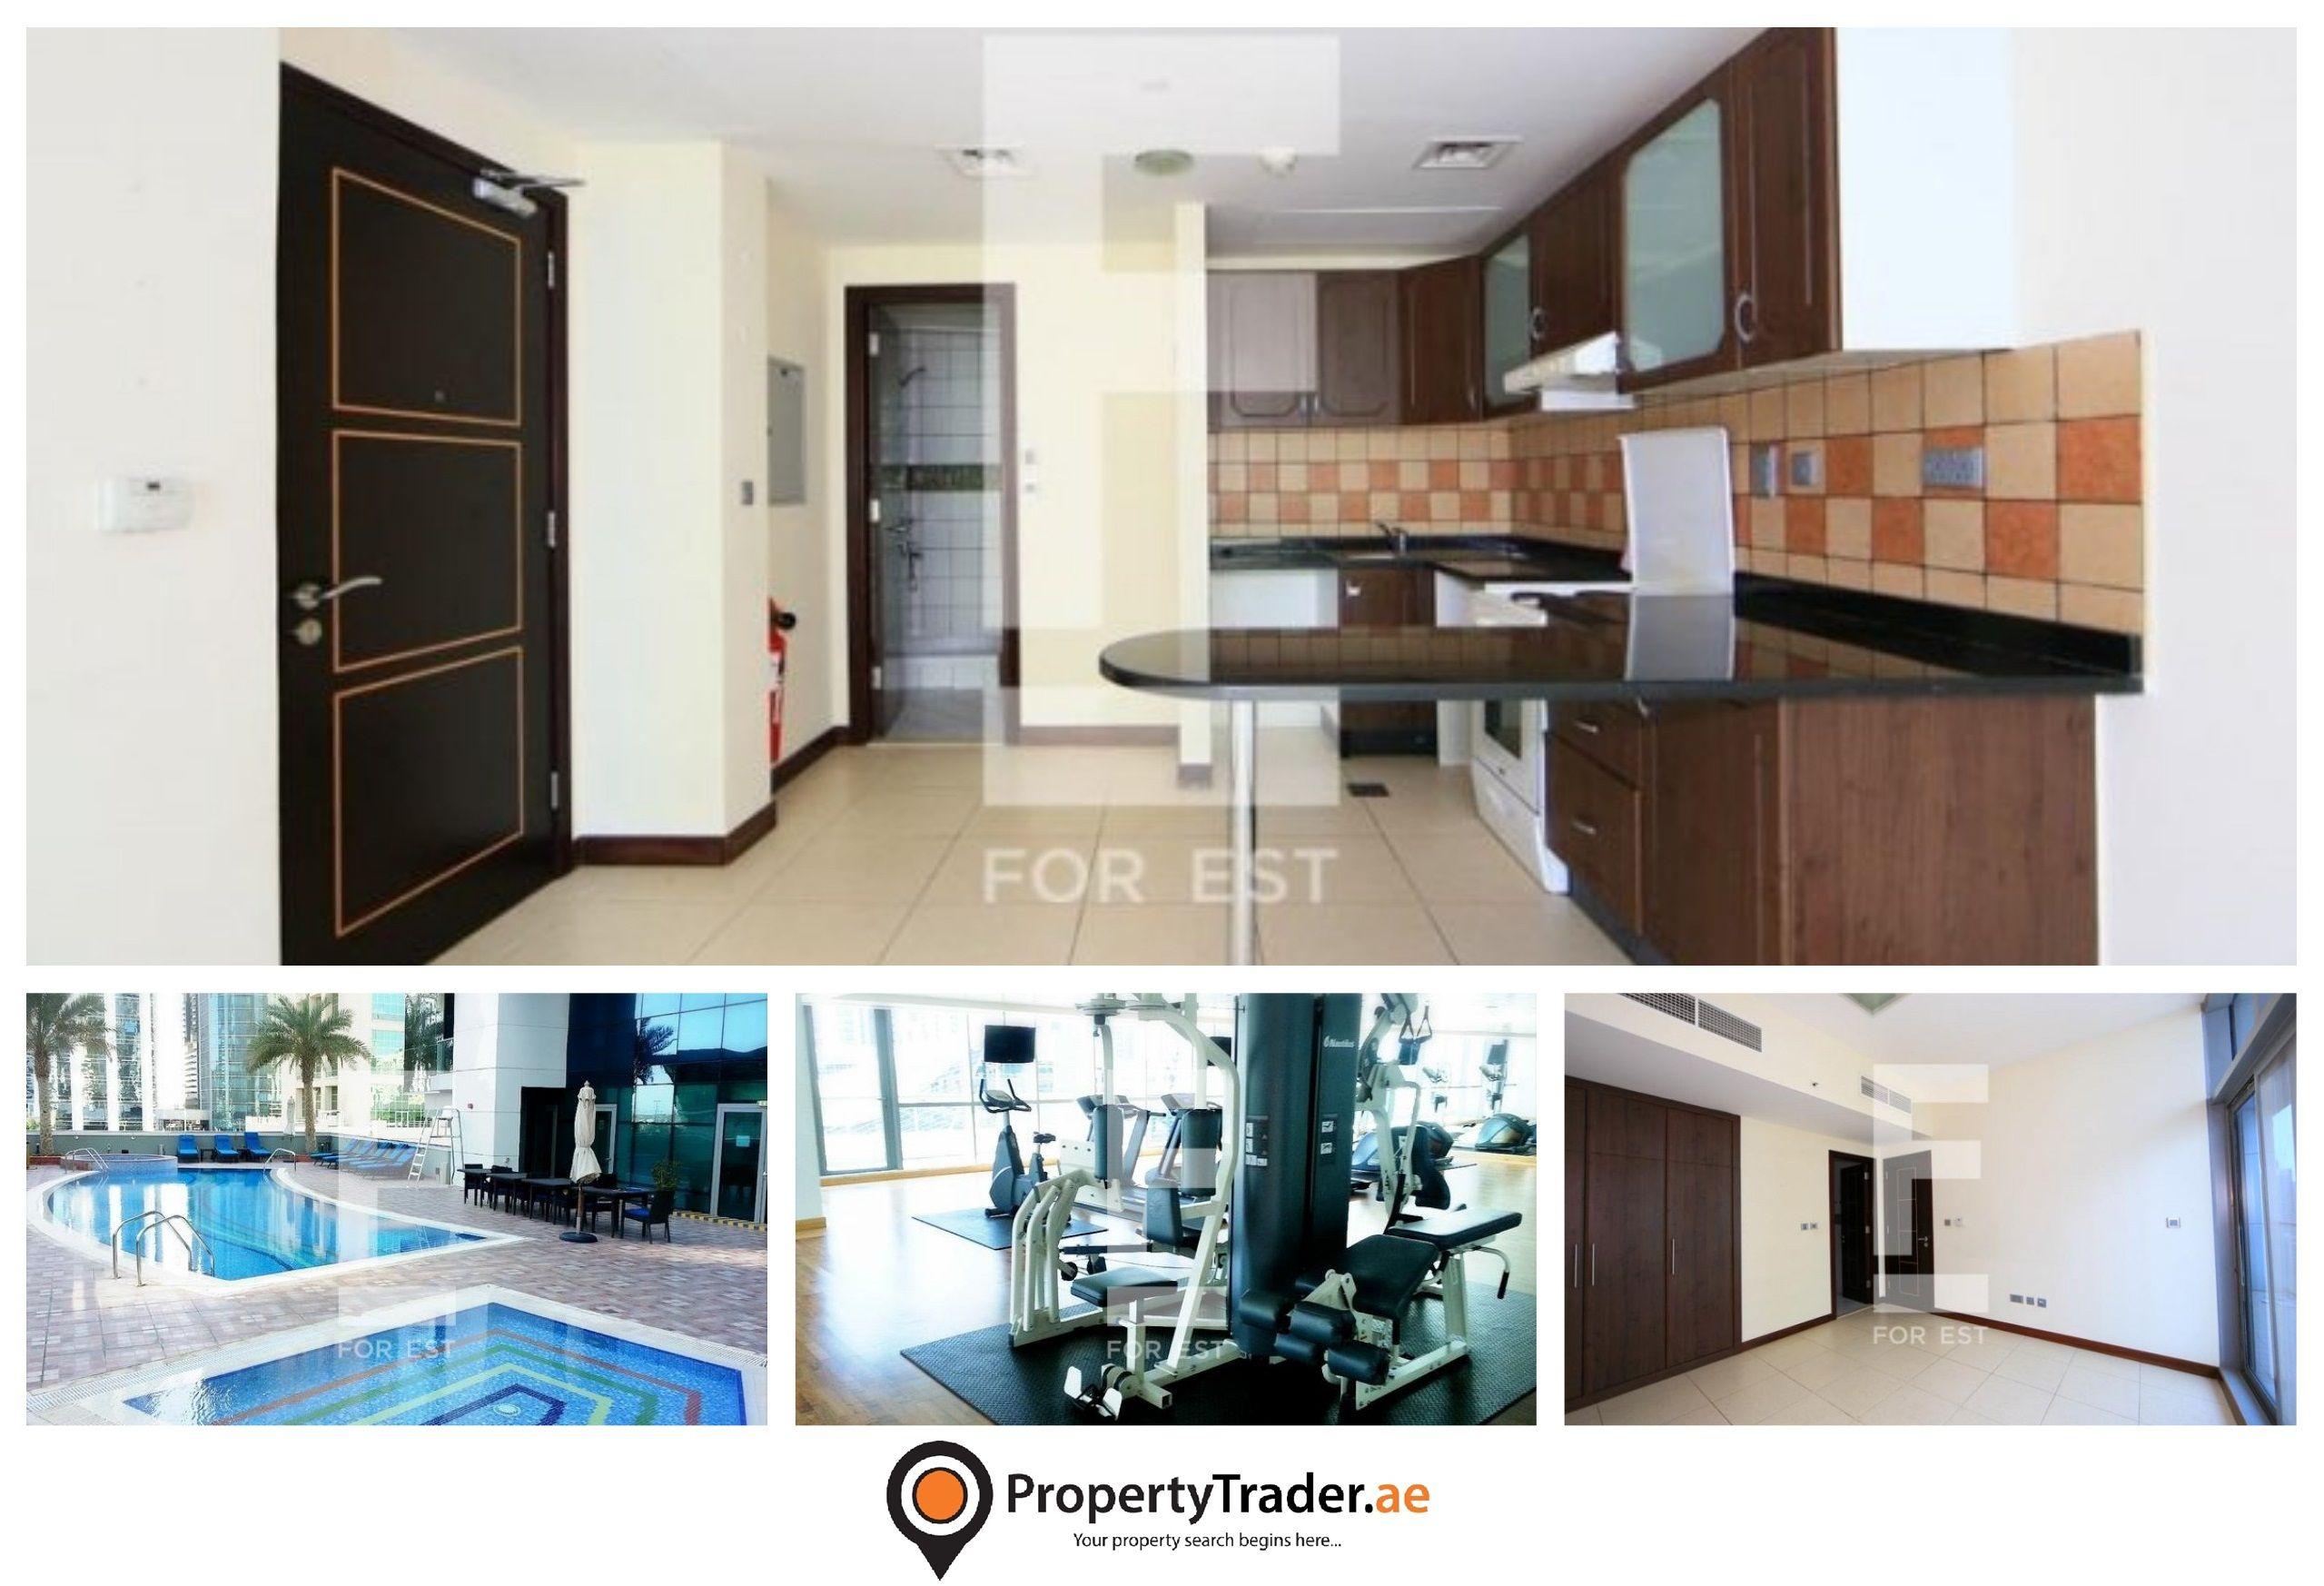 Exclusive Deal Forest Dubai Dubai Jlt 1 Bed Apartment Sale Aed 1 200 000 Apartments For Sale Bedroom Home